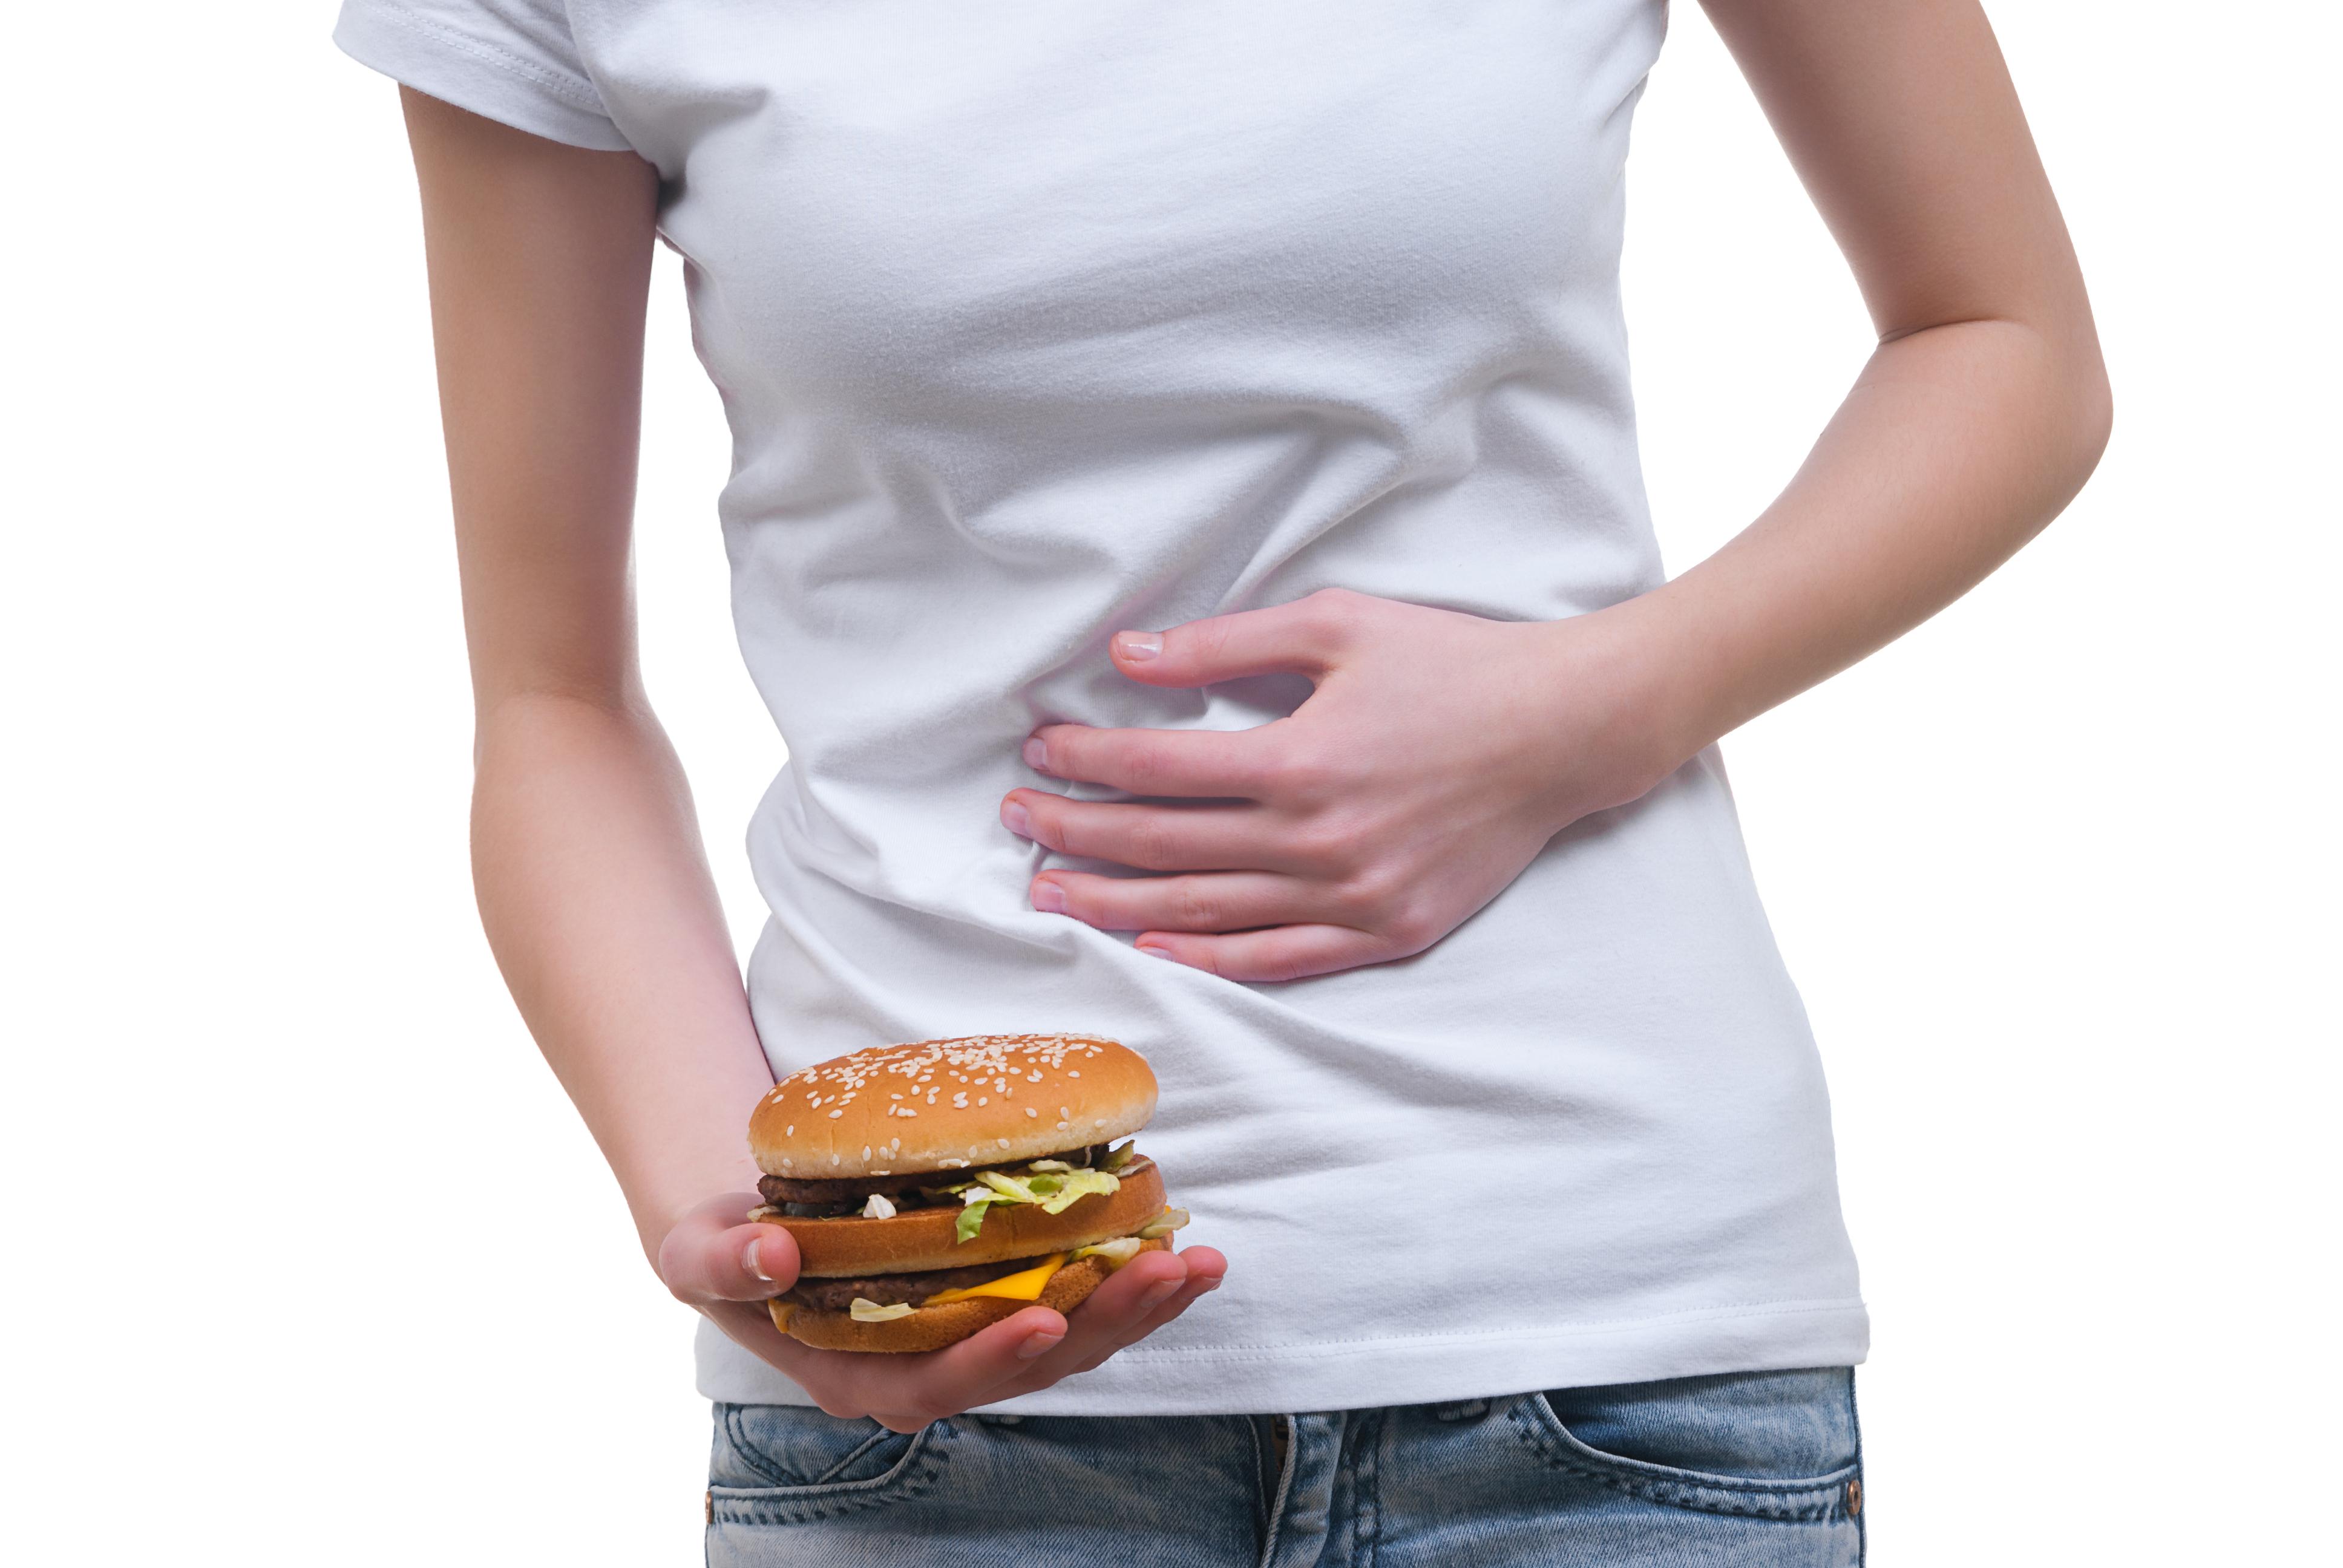 reasons you experience heartburn